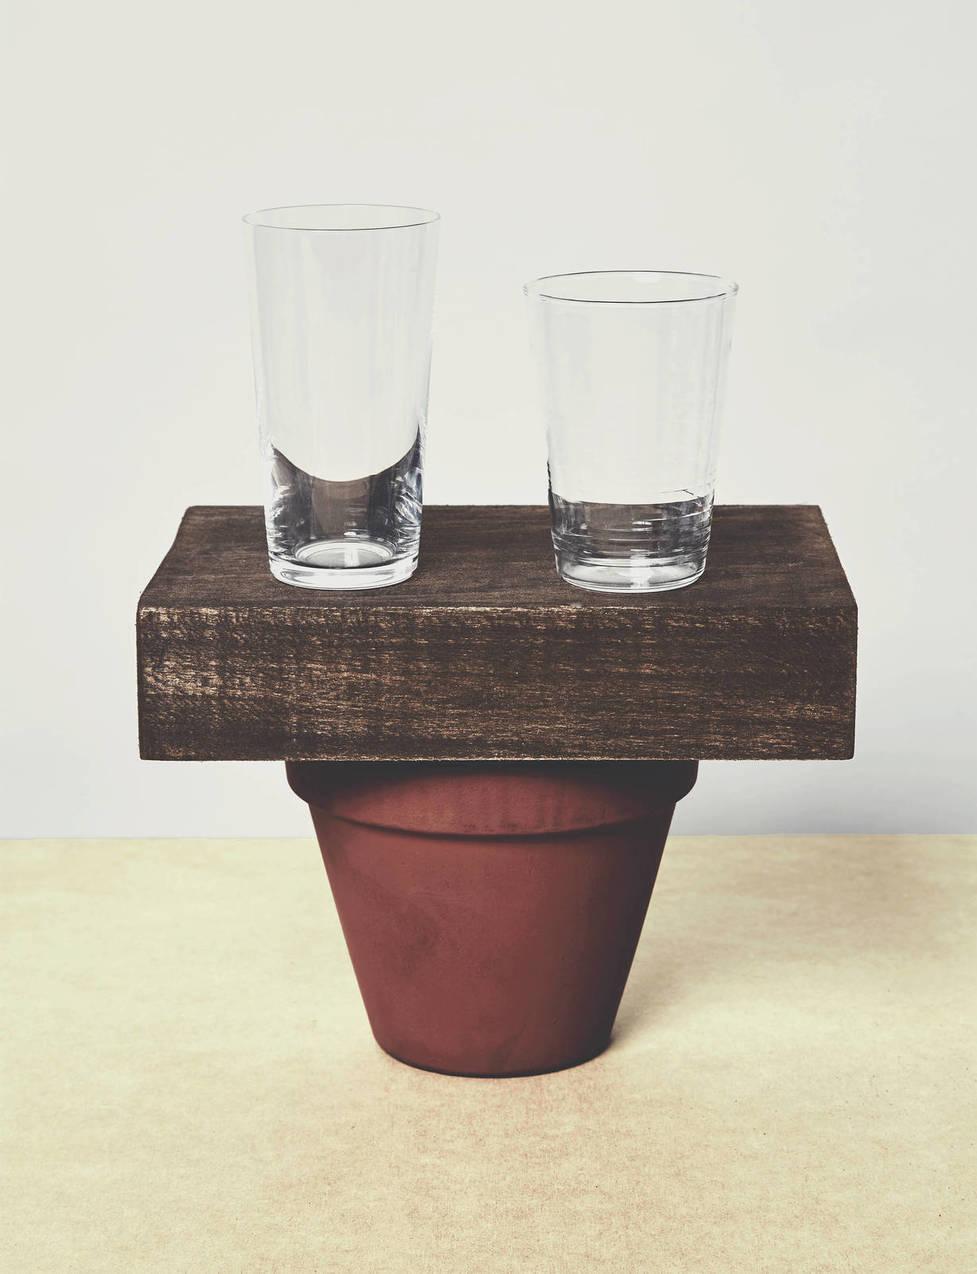 medium_ED_CH_v2.41_ART_OF_ARRANGING_water_glasses.jpg